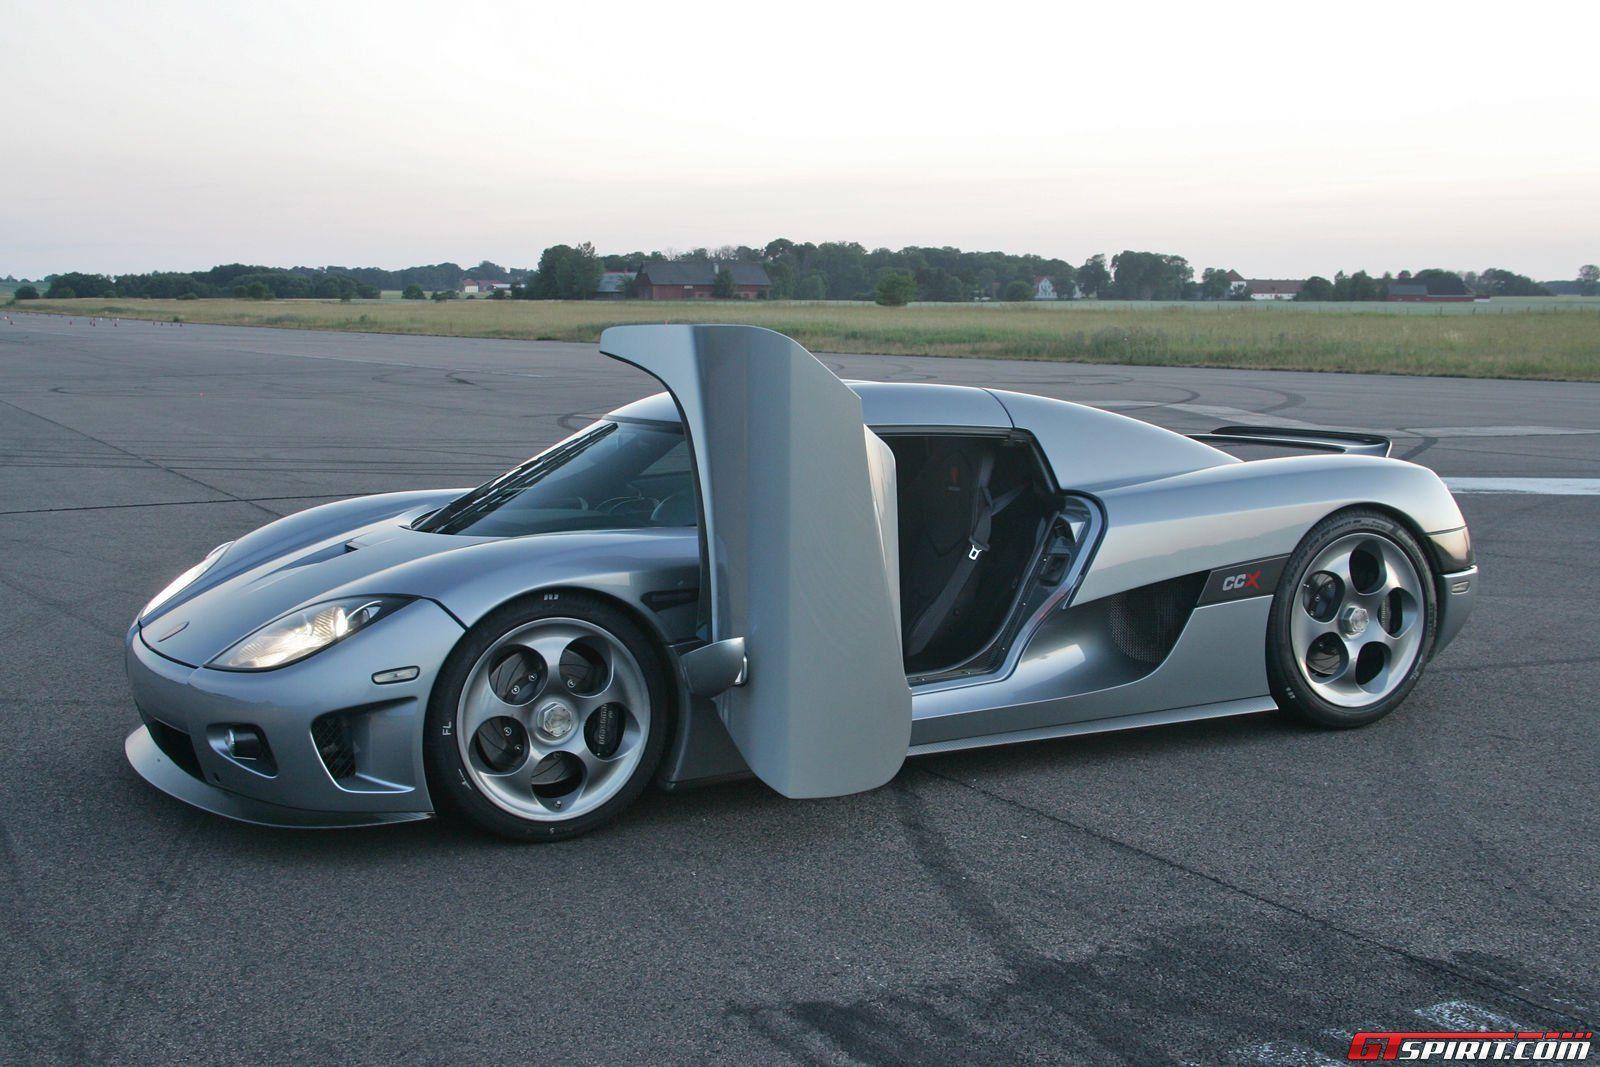 Koenigsegg CCX & Koenigsegg CCX | Rides | Pinterest | Cars Jeep cars and Supercar